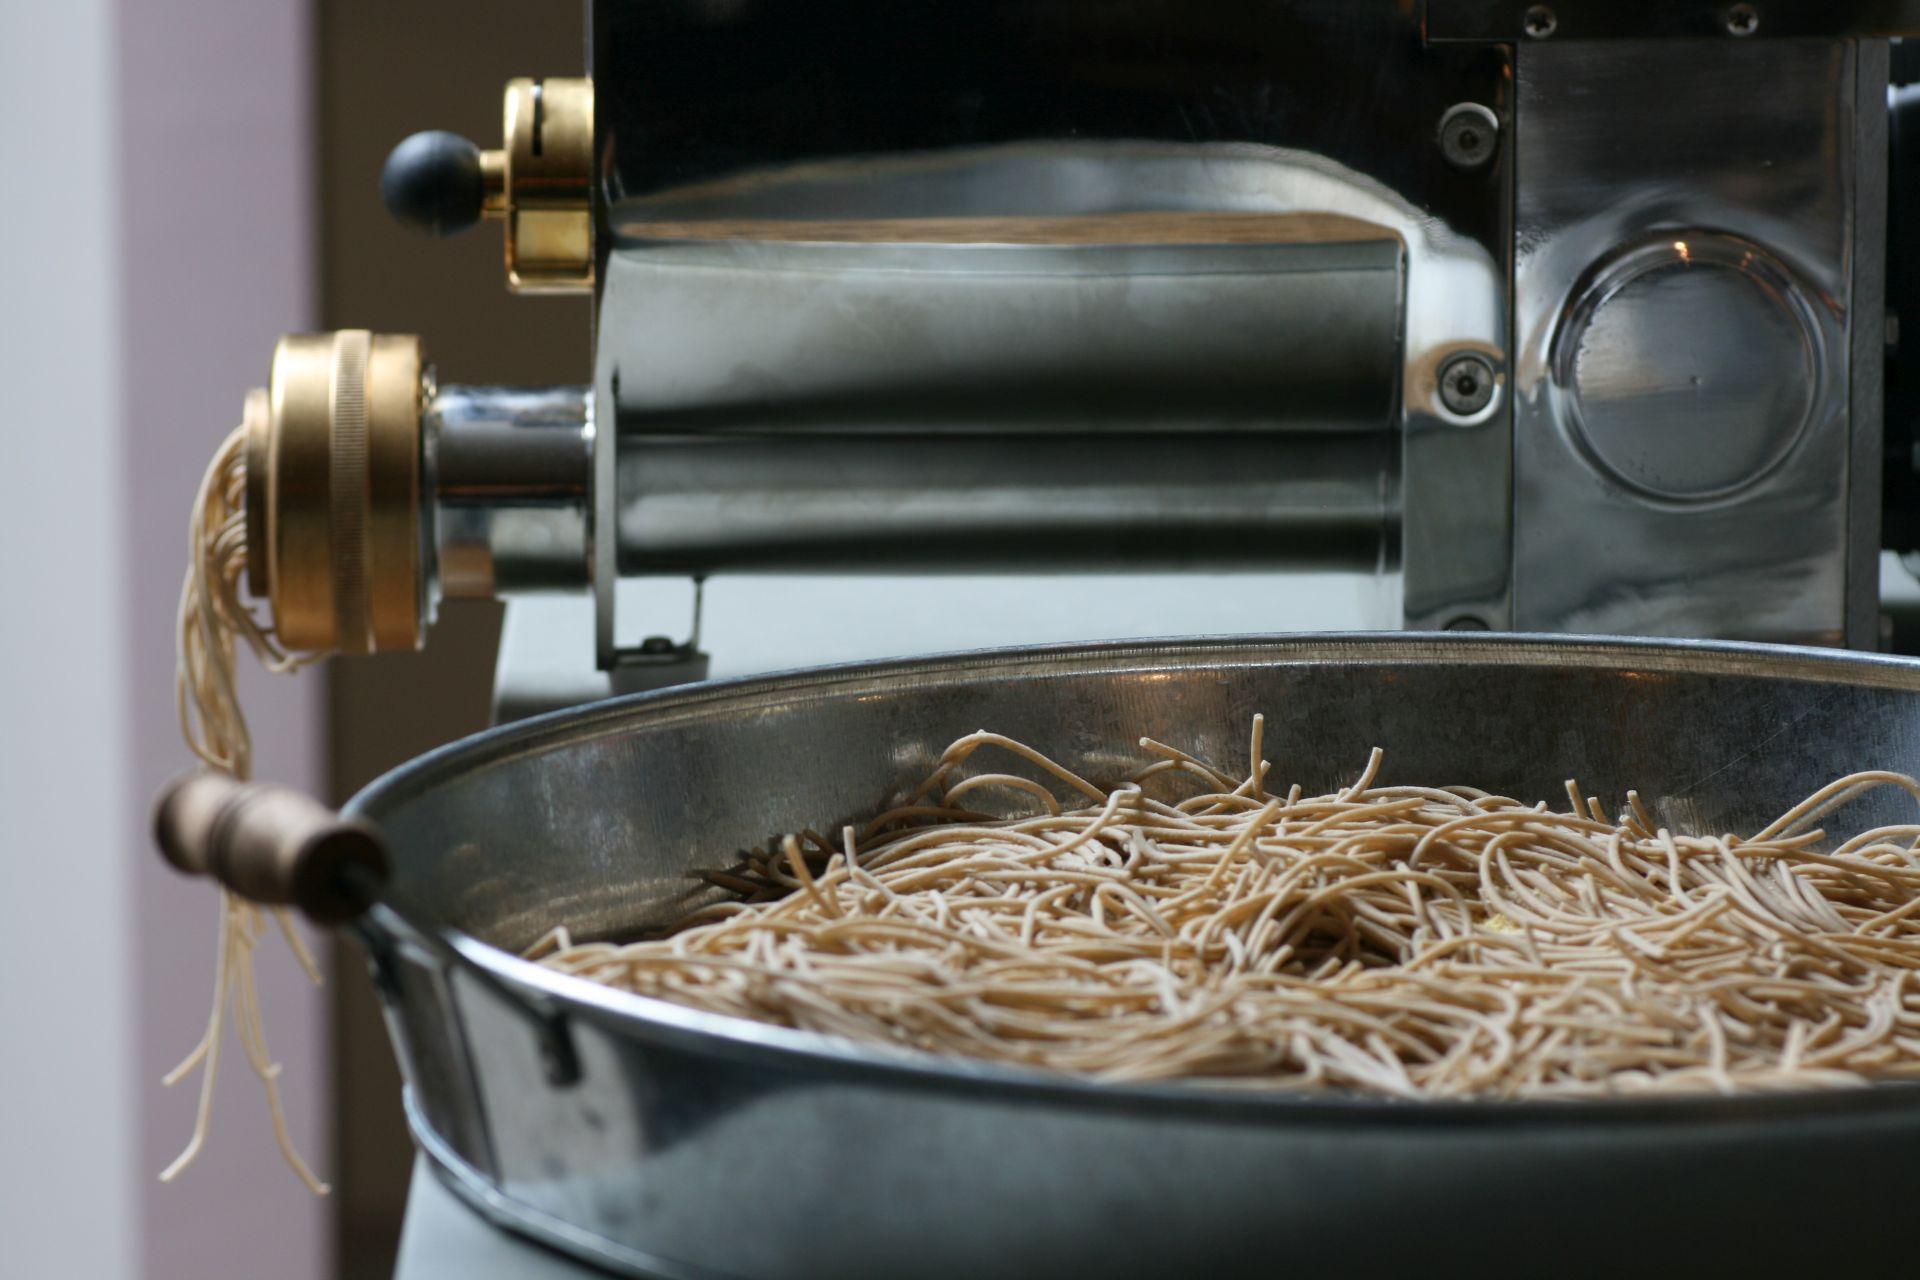 Pesto, Pasta, Basilikum, Pistanzie, rote Beete, Petersilie, Parmesan, Olivenöl, Italien, Häussler, Pasta